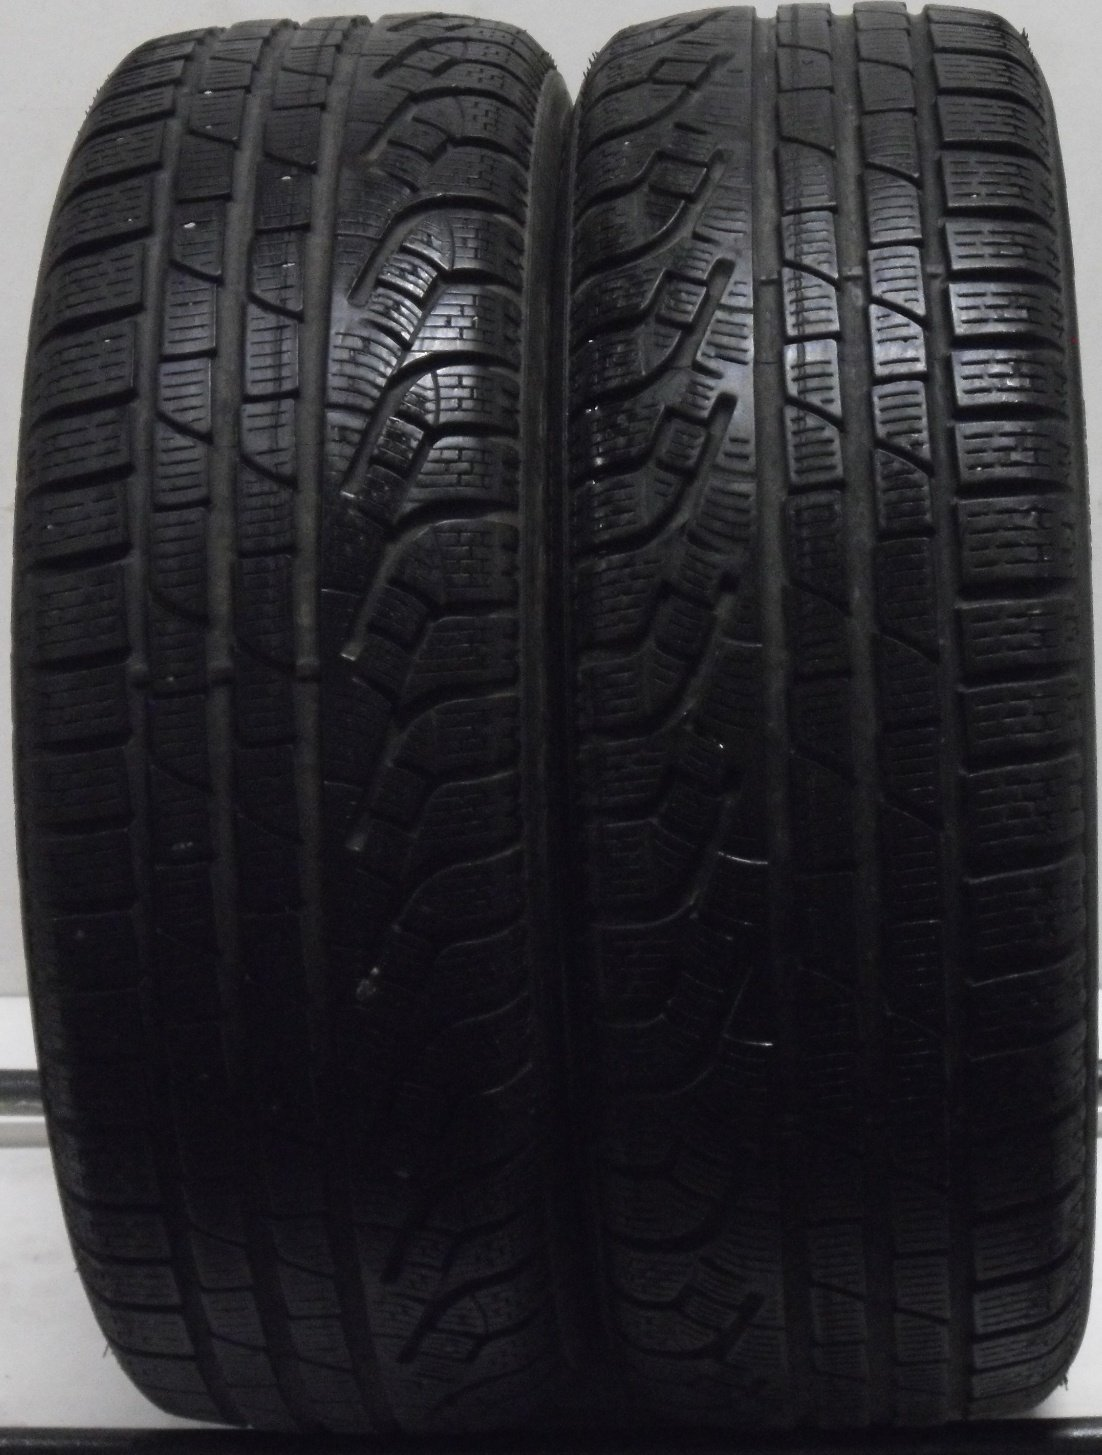 2 2056016 96H Pirelli Winter Sottozero 210 Part Worn Used Car Tyres